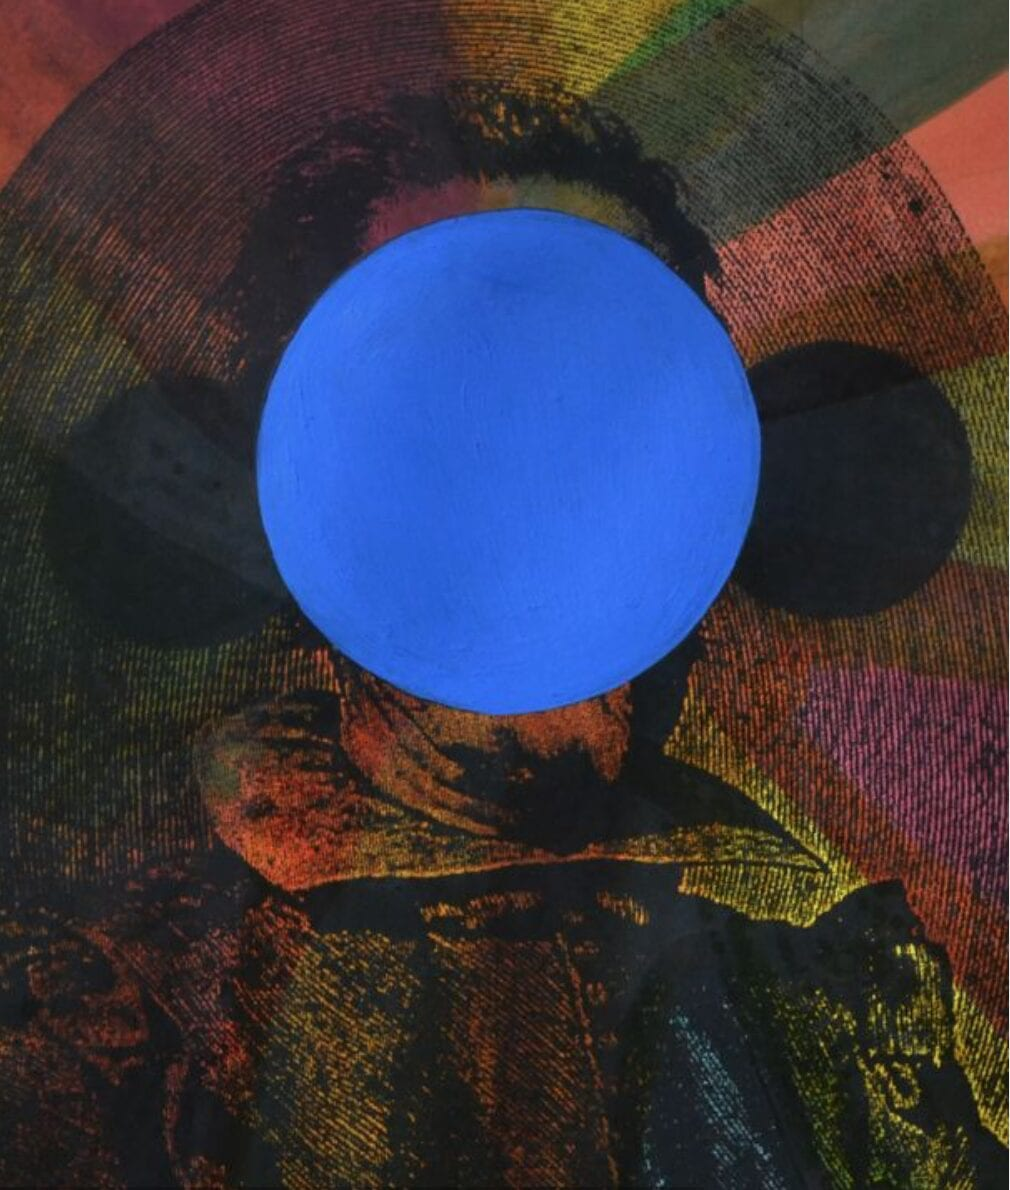 Lado Pochkhua, Untitled from Series Enigma of David G,  Mixed Media, 29 x 20 cm, 2015.